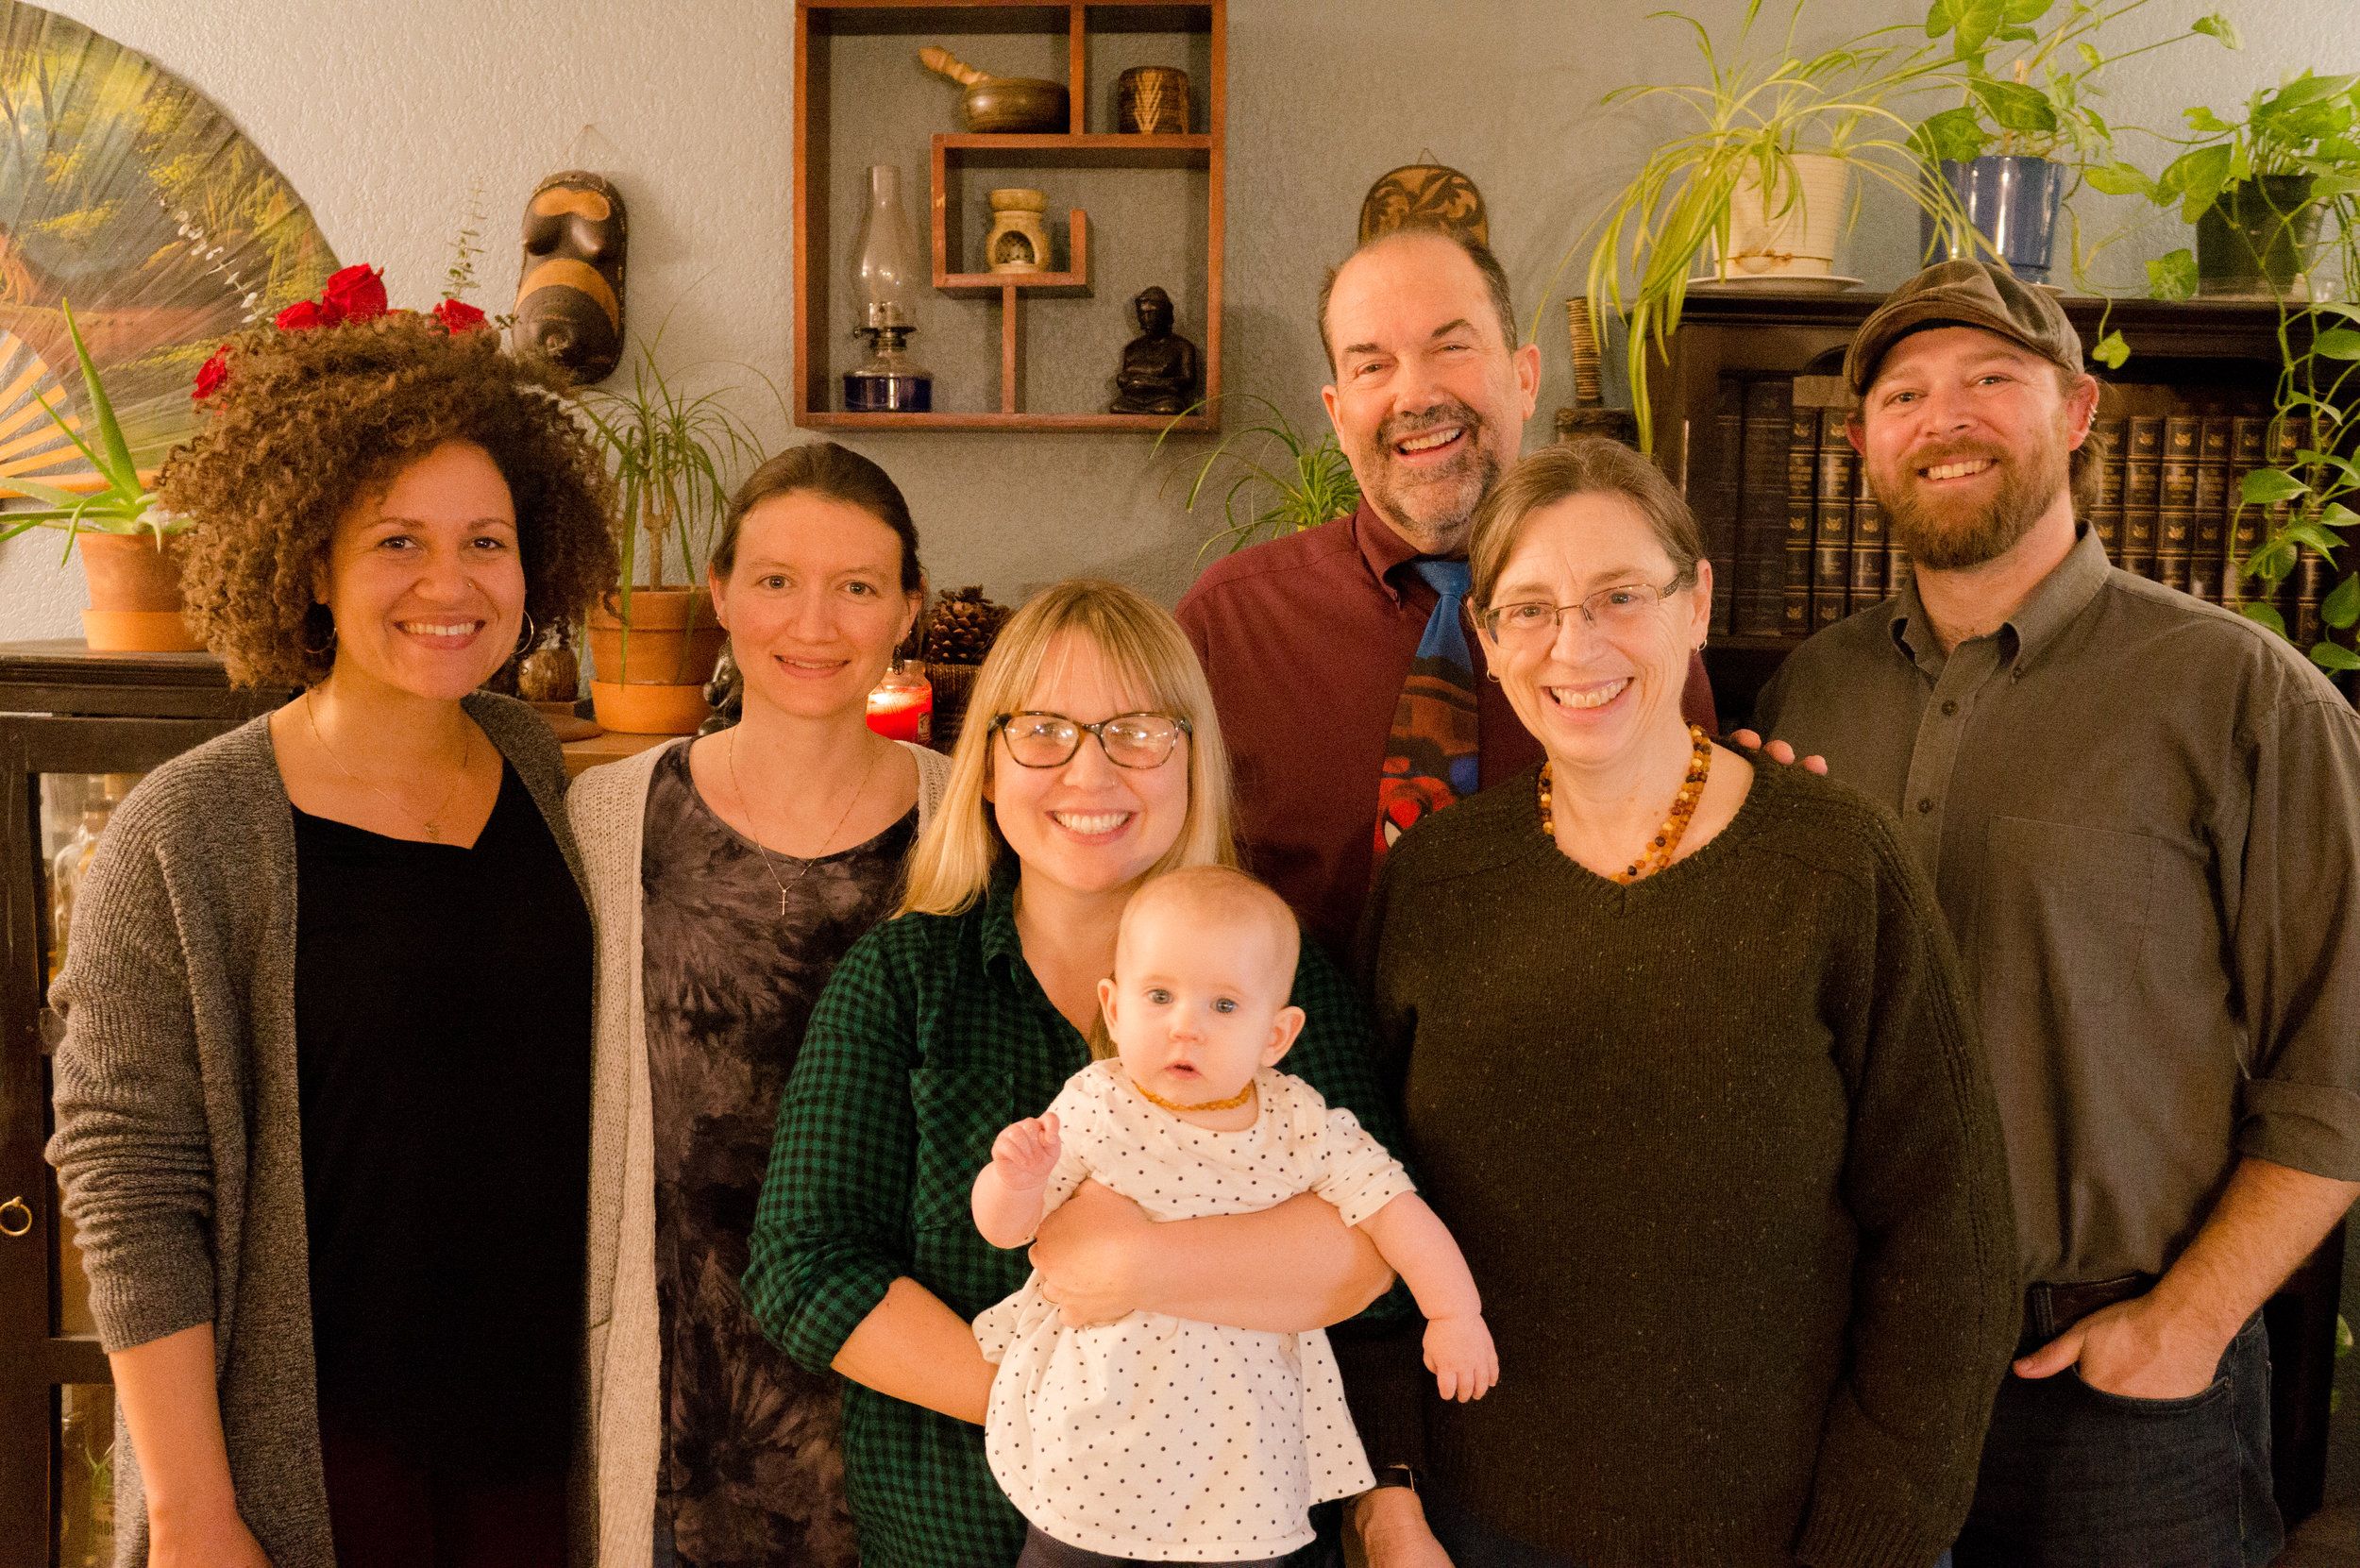 Left to Right: Rachel Williams, Kristen Benoit, Becka Frankie, Tim Herndon, Vicki Penwell, Ian Penwell